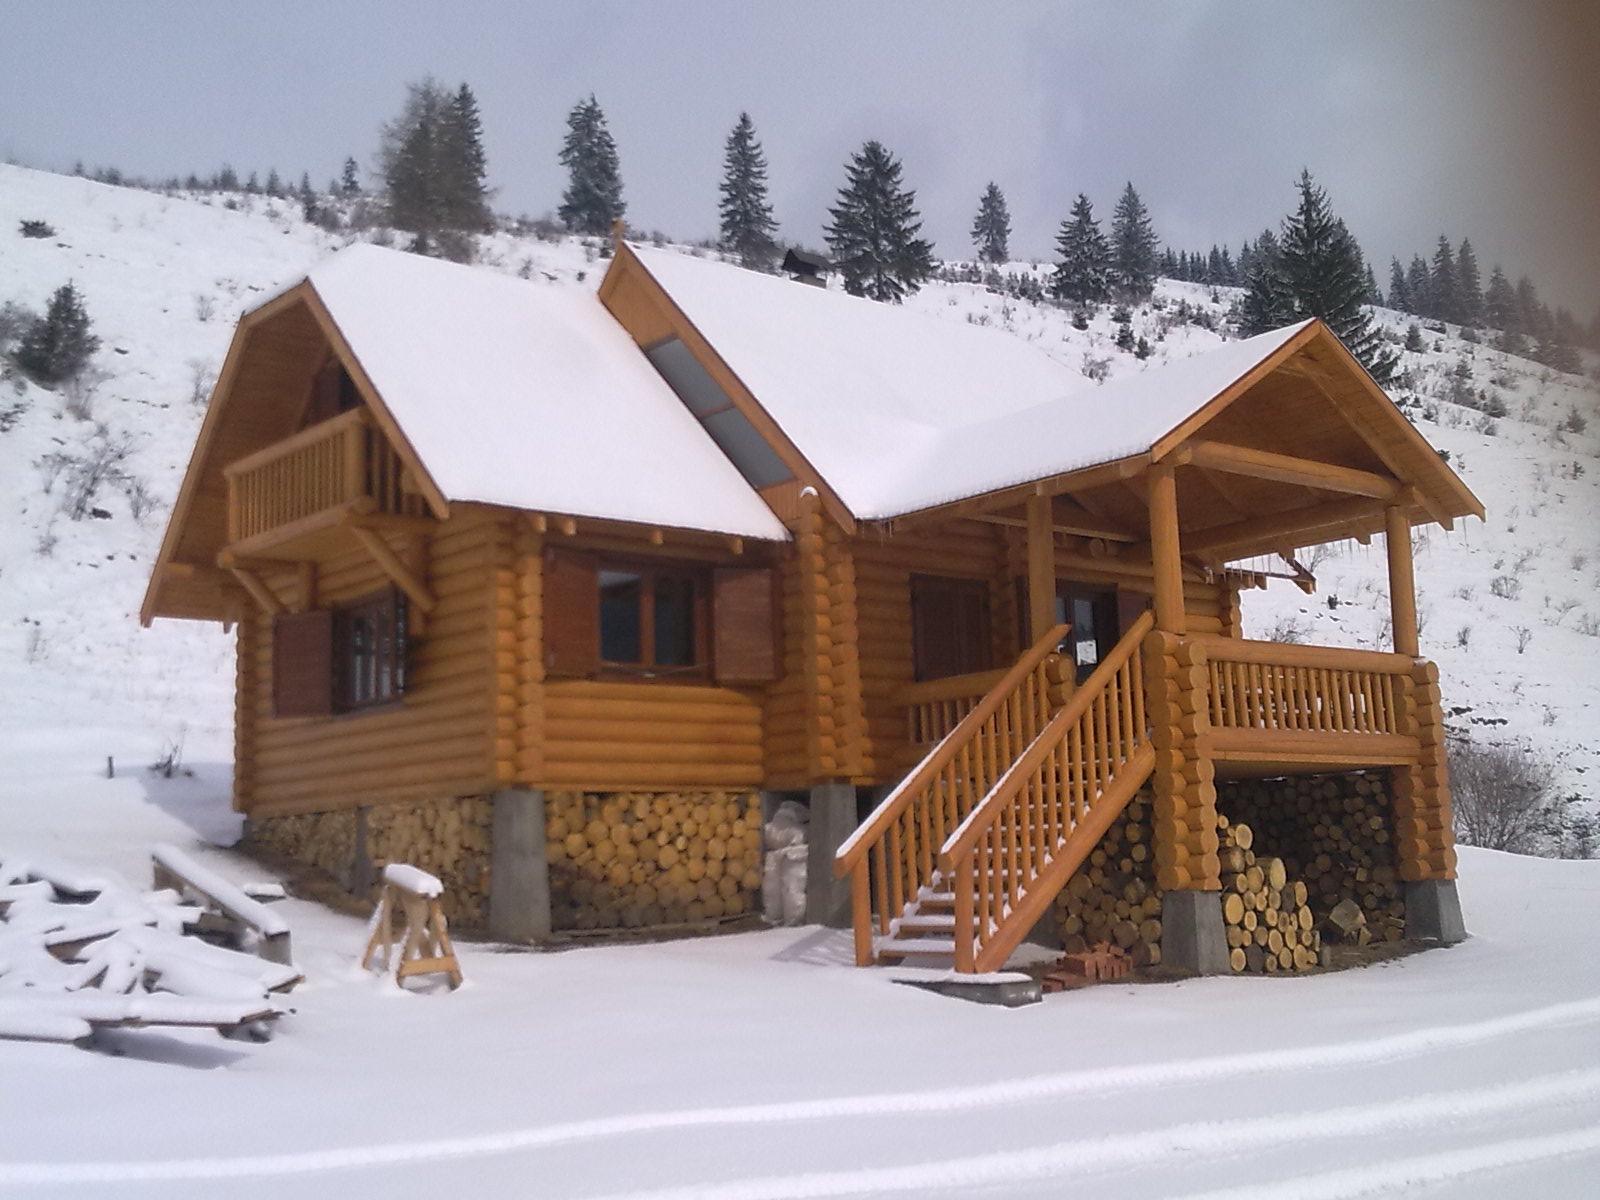 Vanzare case cabane din busteni rotunzi - Casas de troncos redondos ...